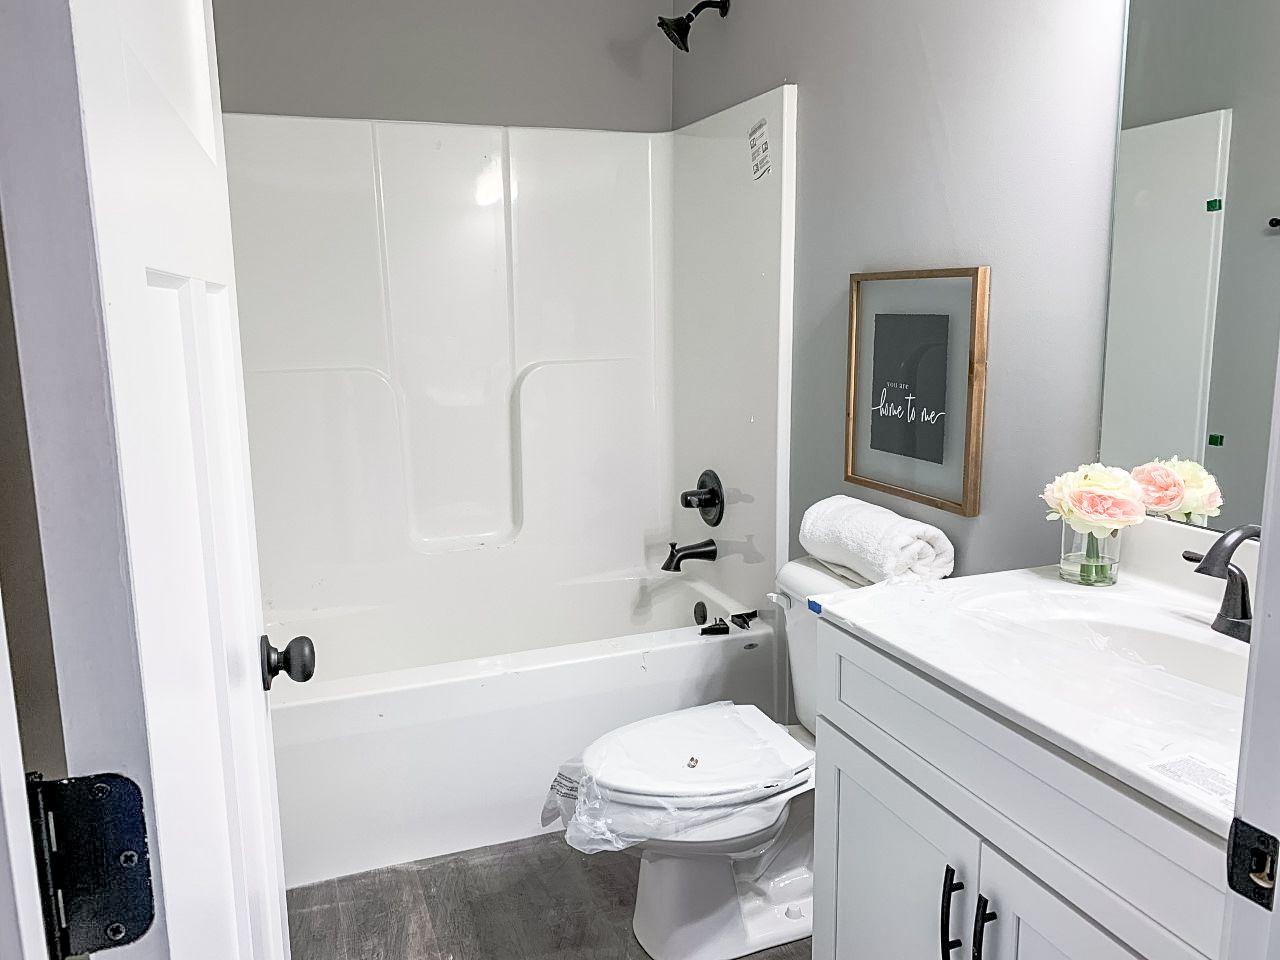 Bathroom featured in the Prescott B By C.A. Jones, Inc.  in St. Louis, IL